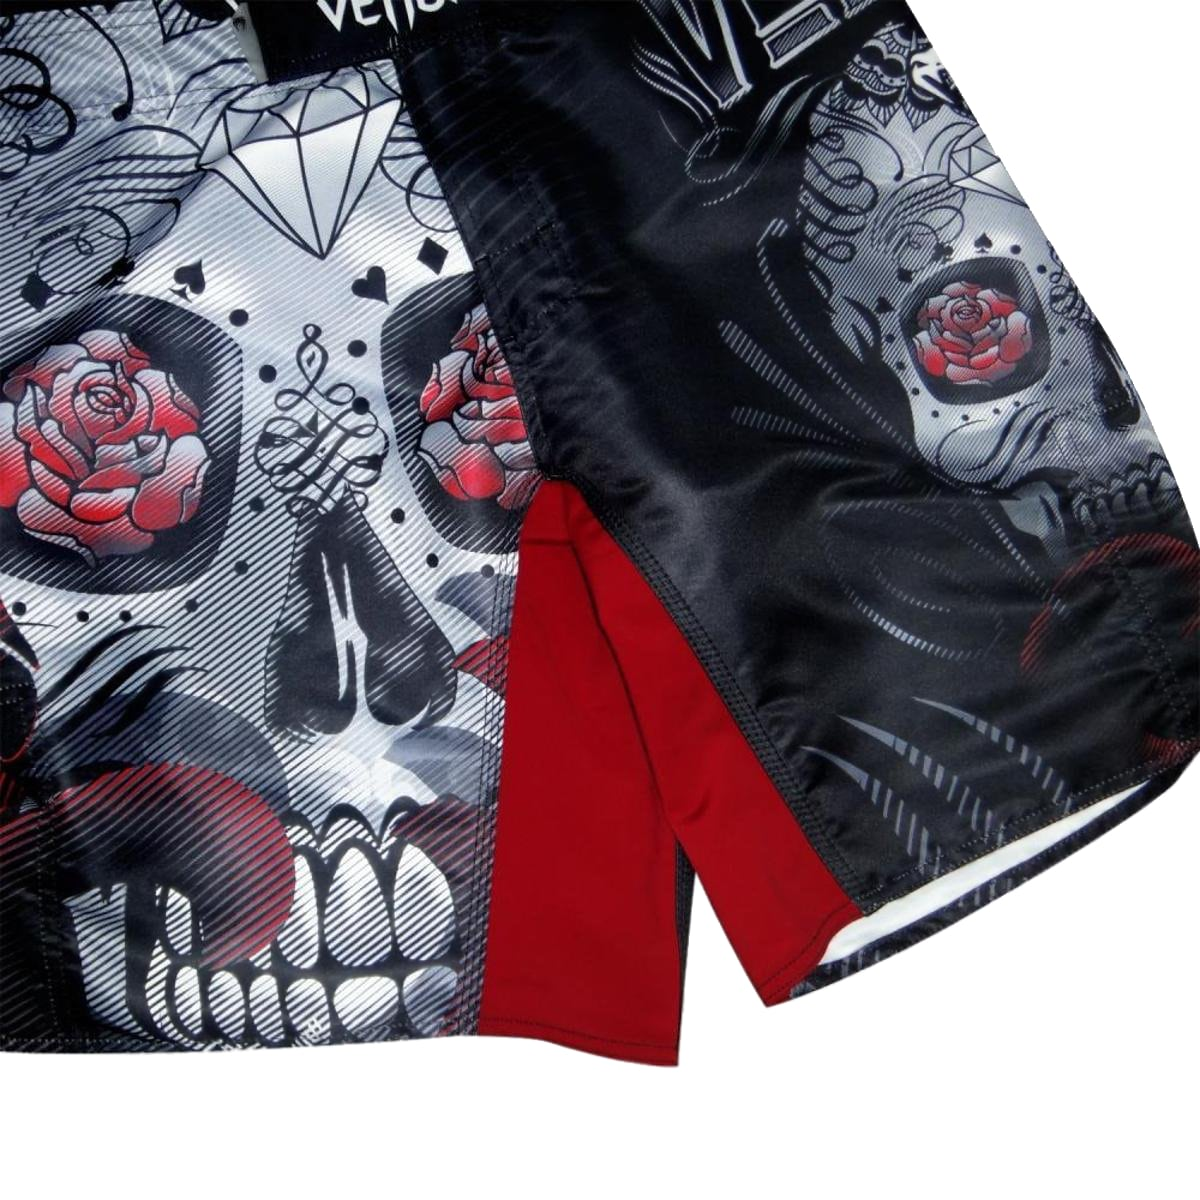 Bermuda Venum Skull and Roses - Preto